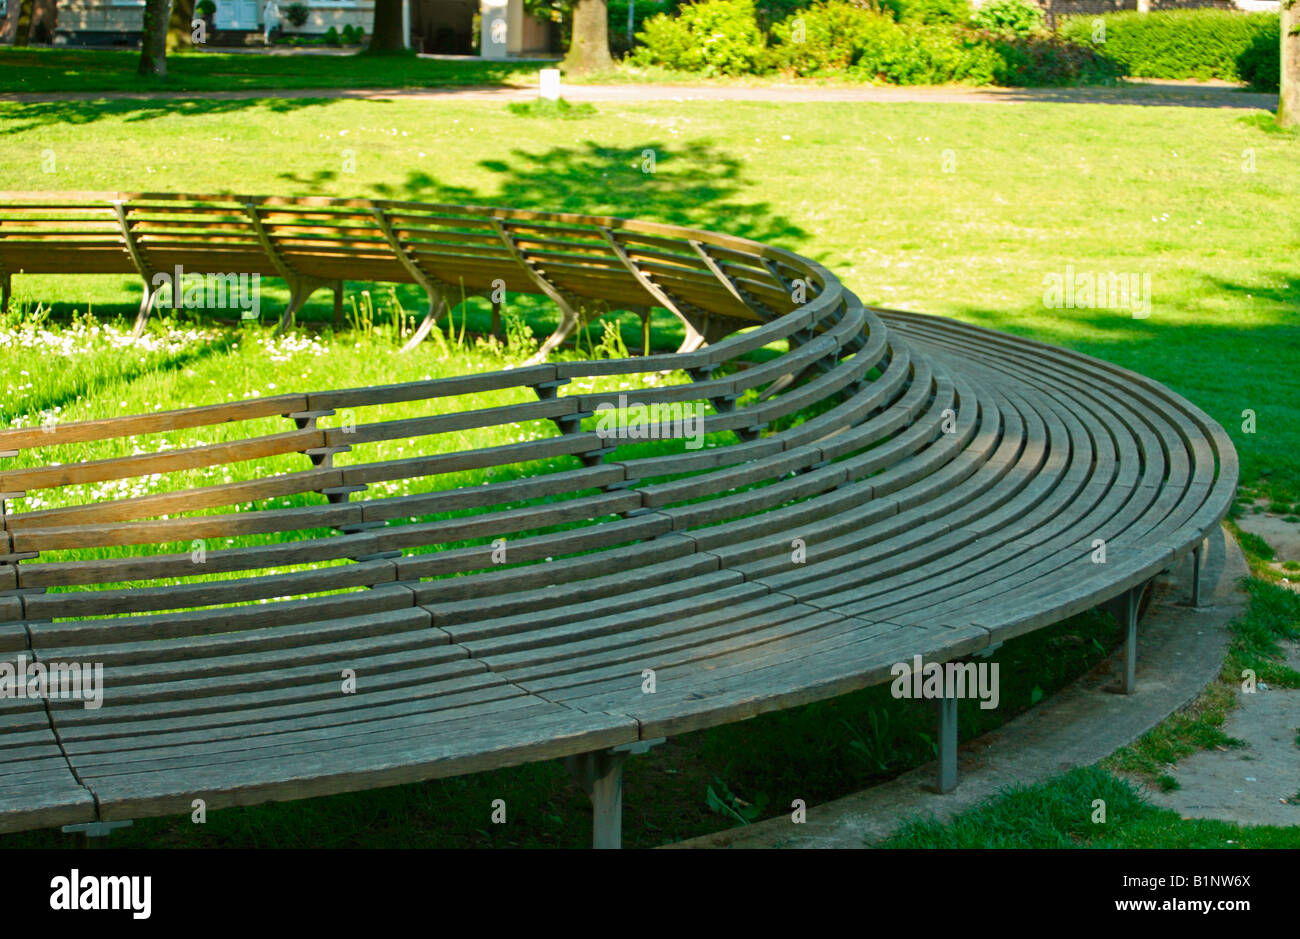 Circular park bench / art installation, Kempen, North Rhine-Westphalia, Germany - Stock Image